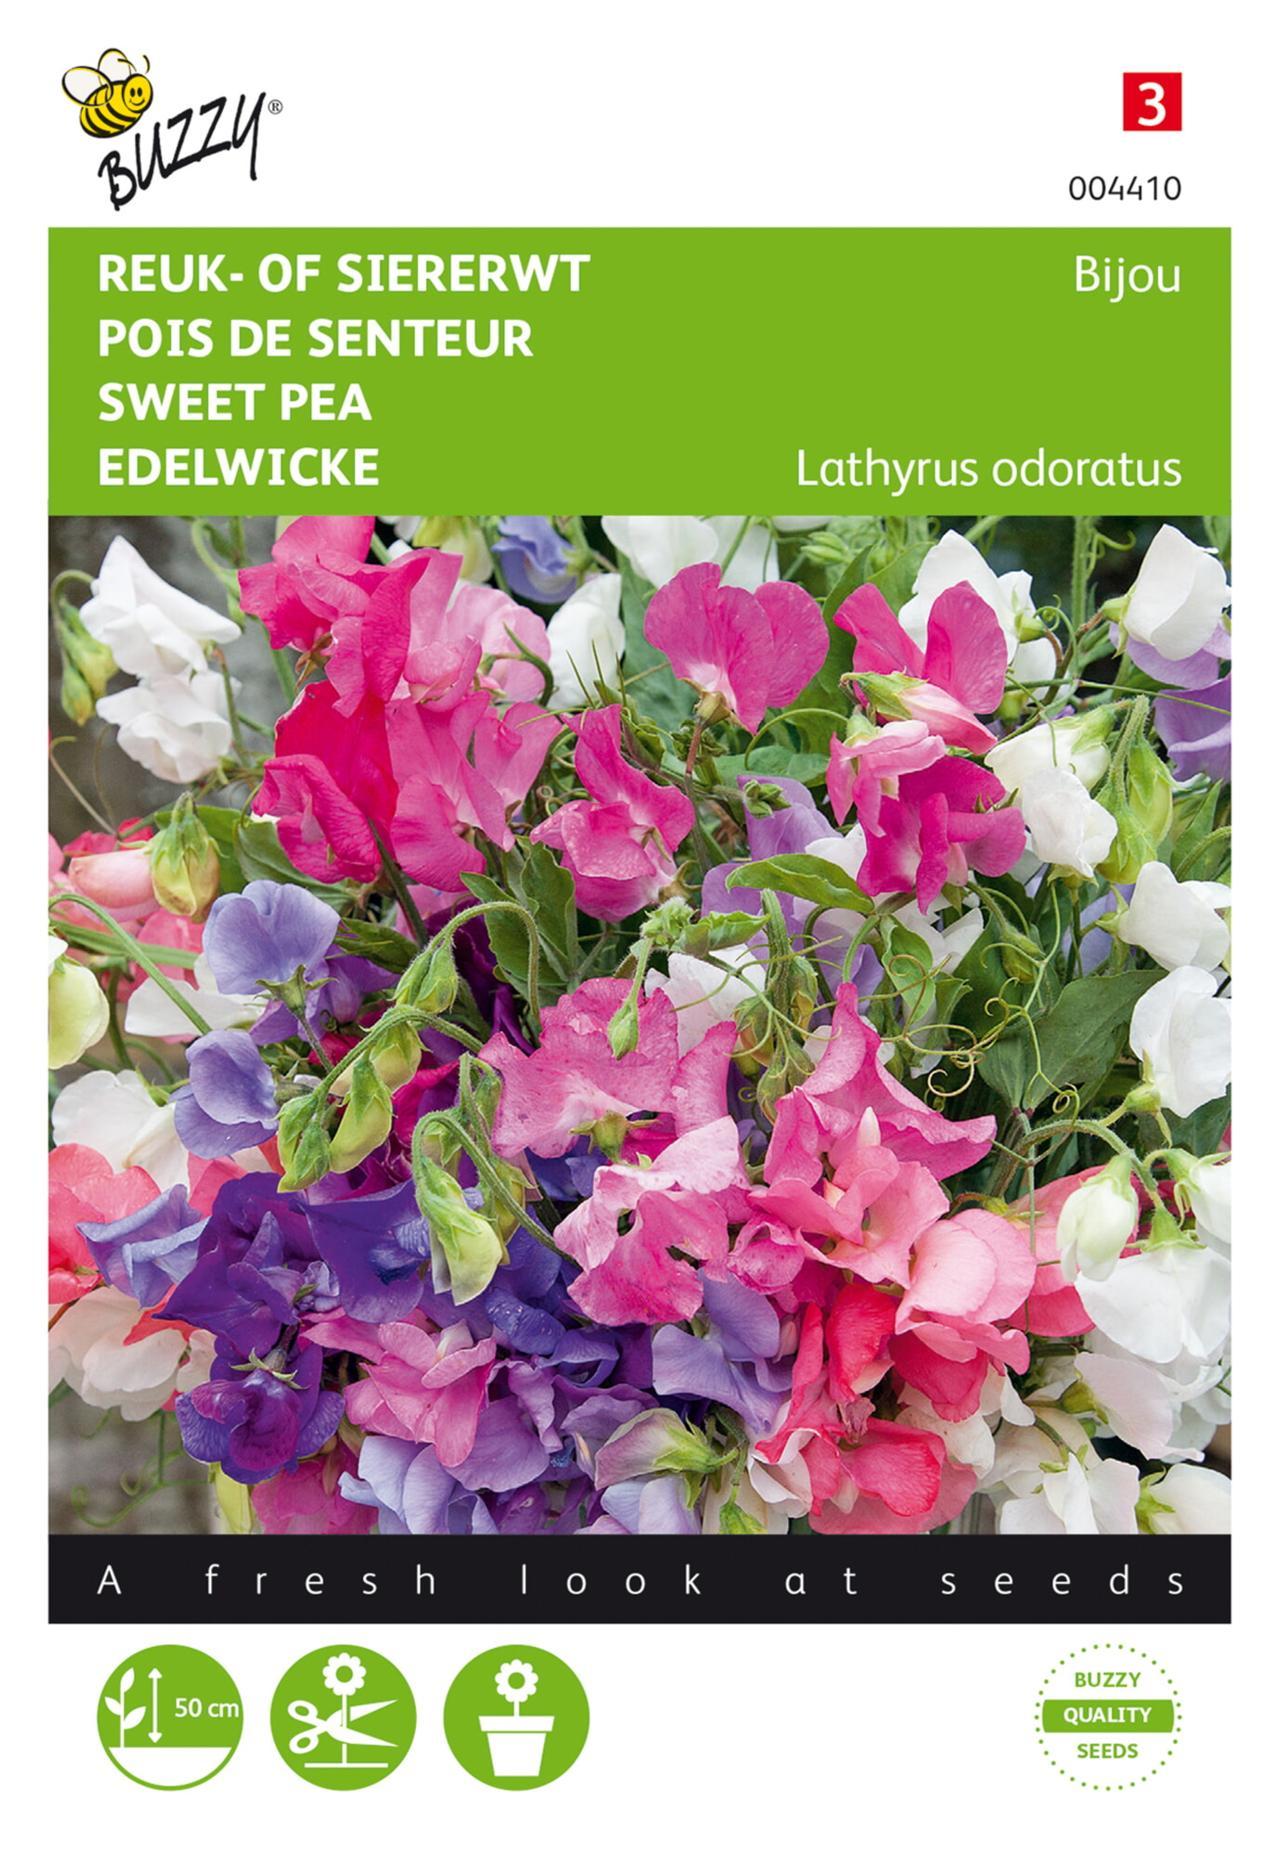 Lathyrus odoratus 'Bijou' plant